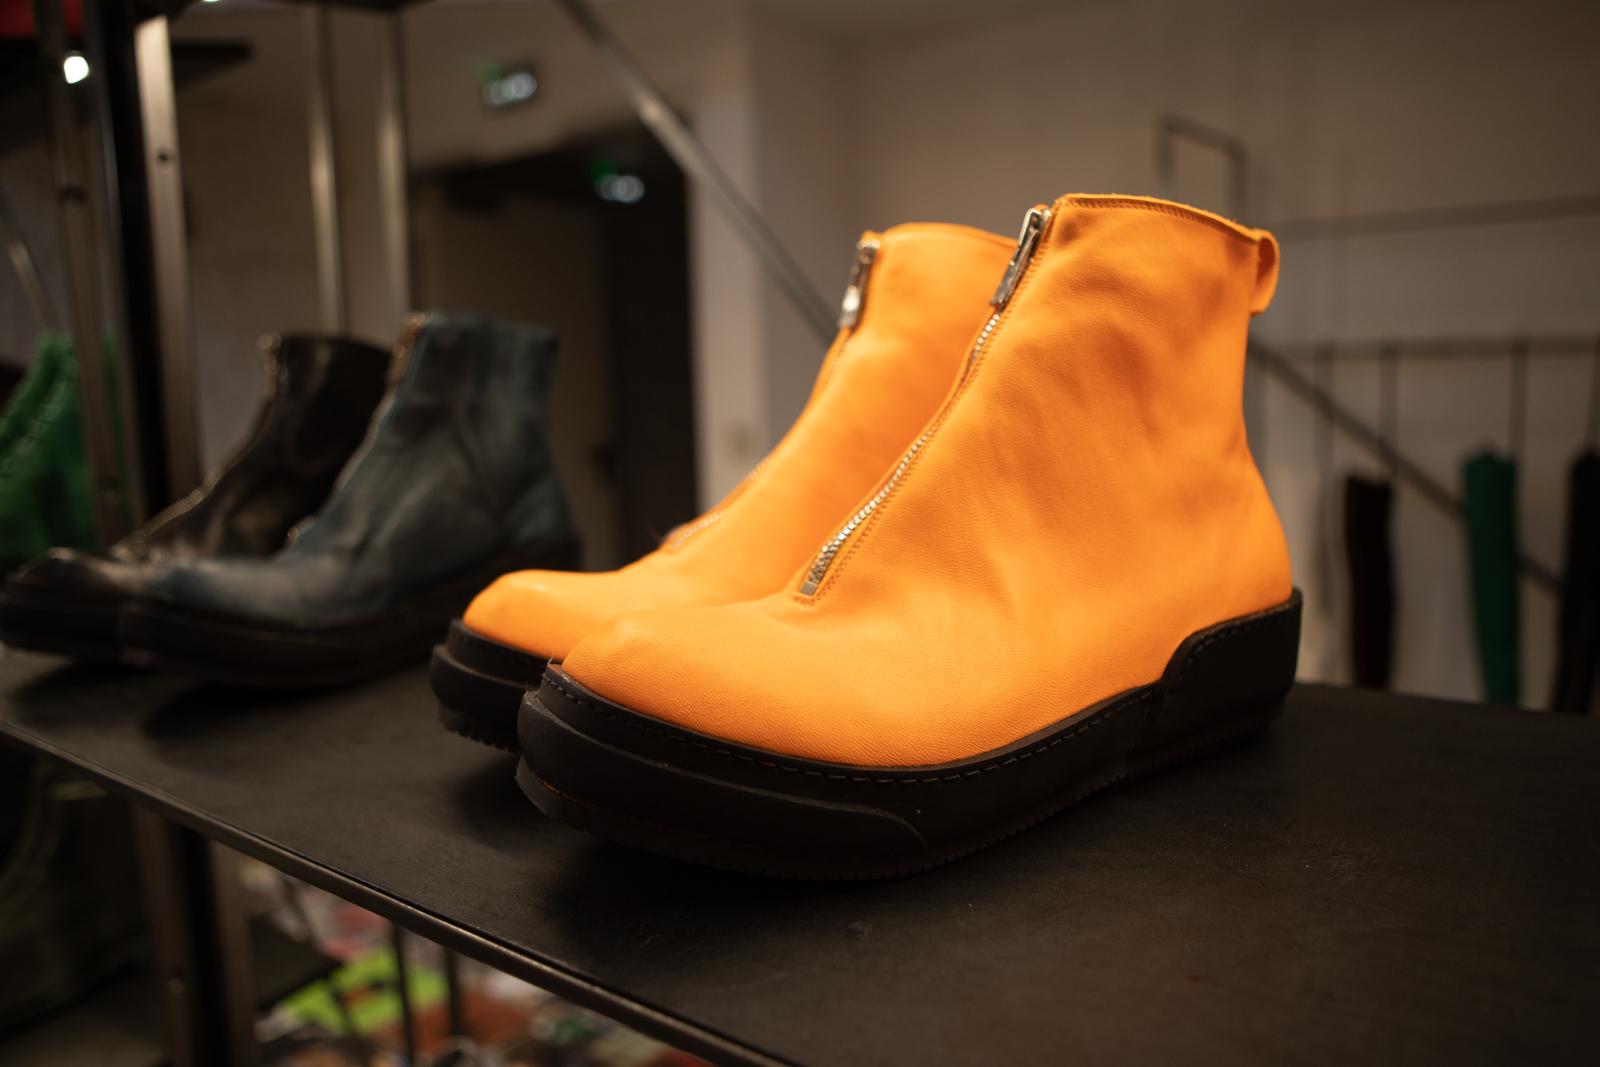 Guidi PLS Sneakers in Orange FW20